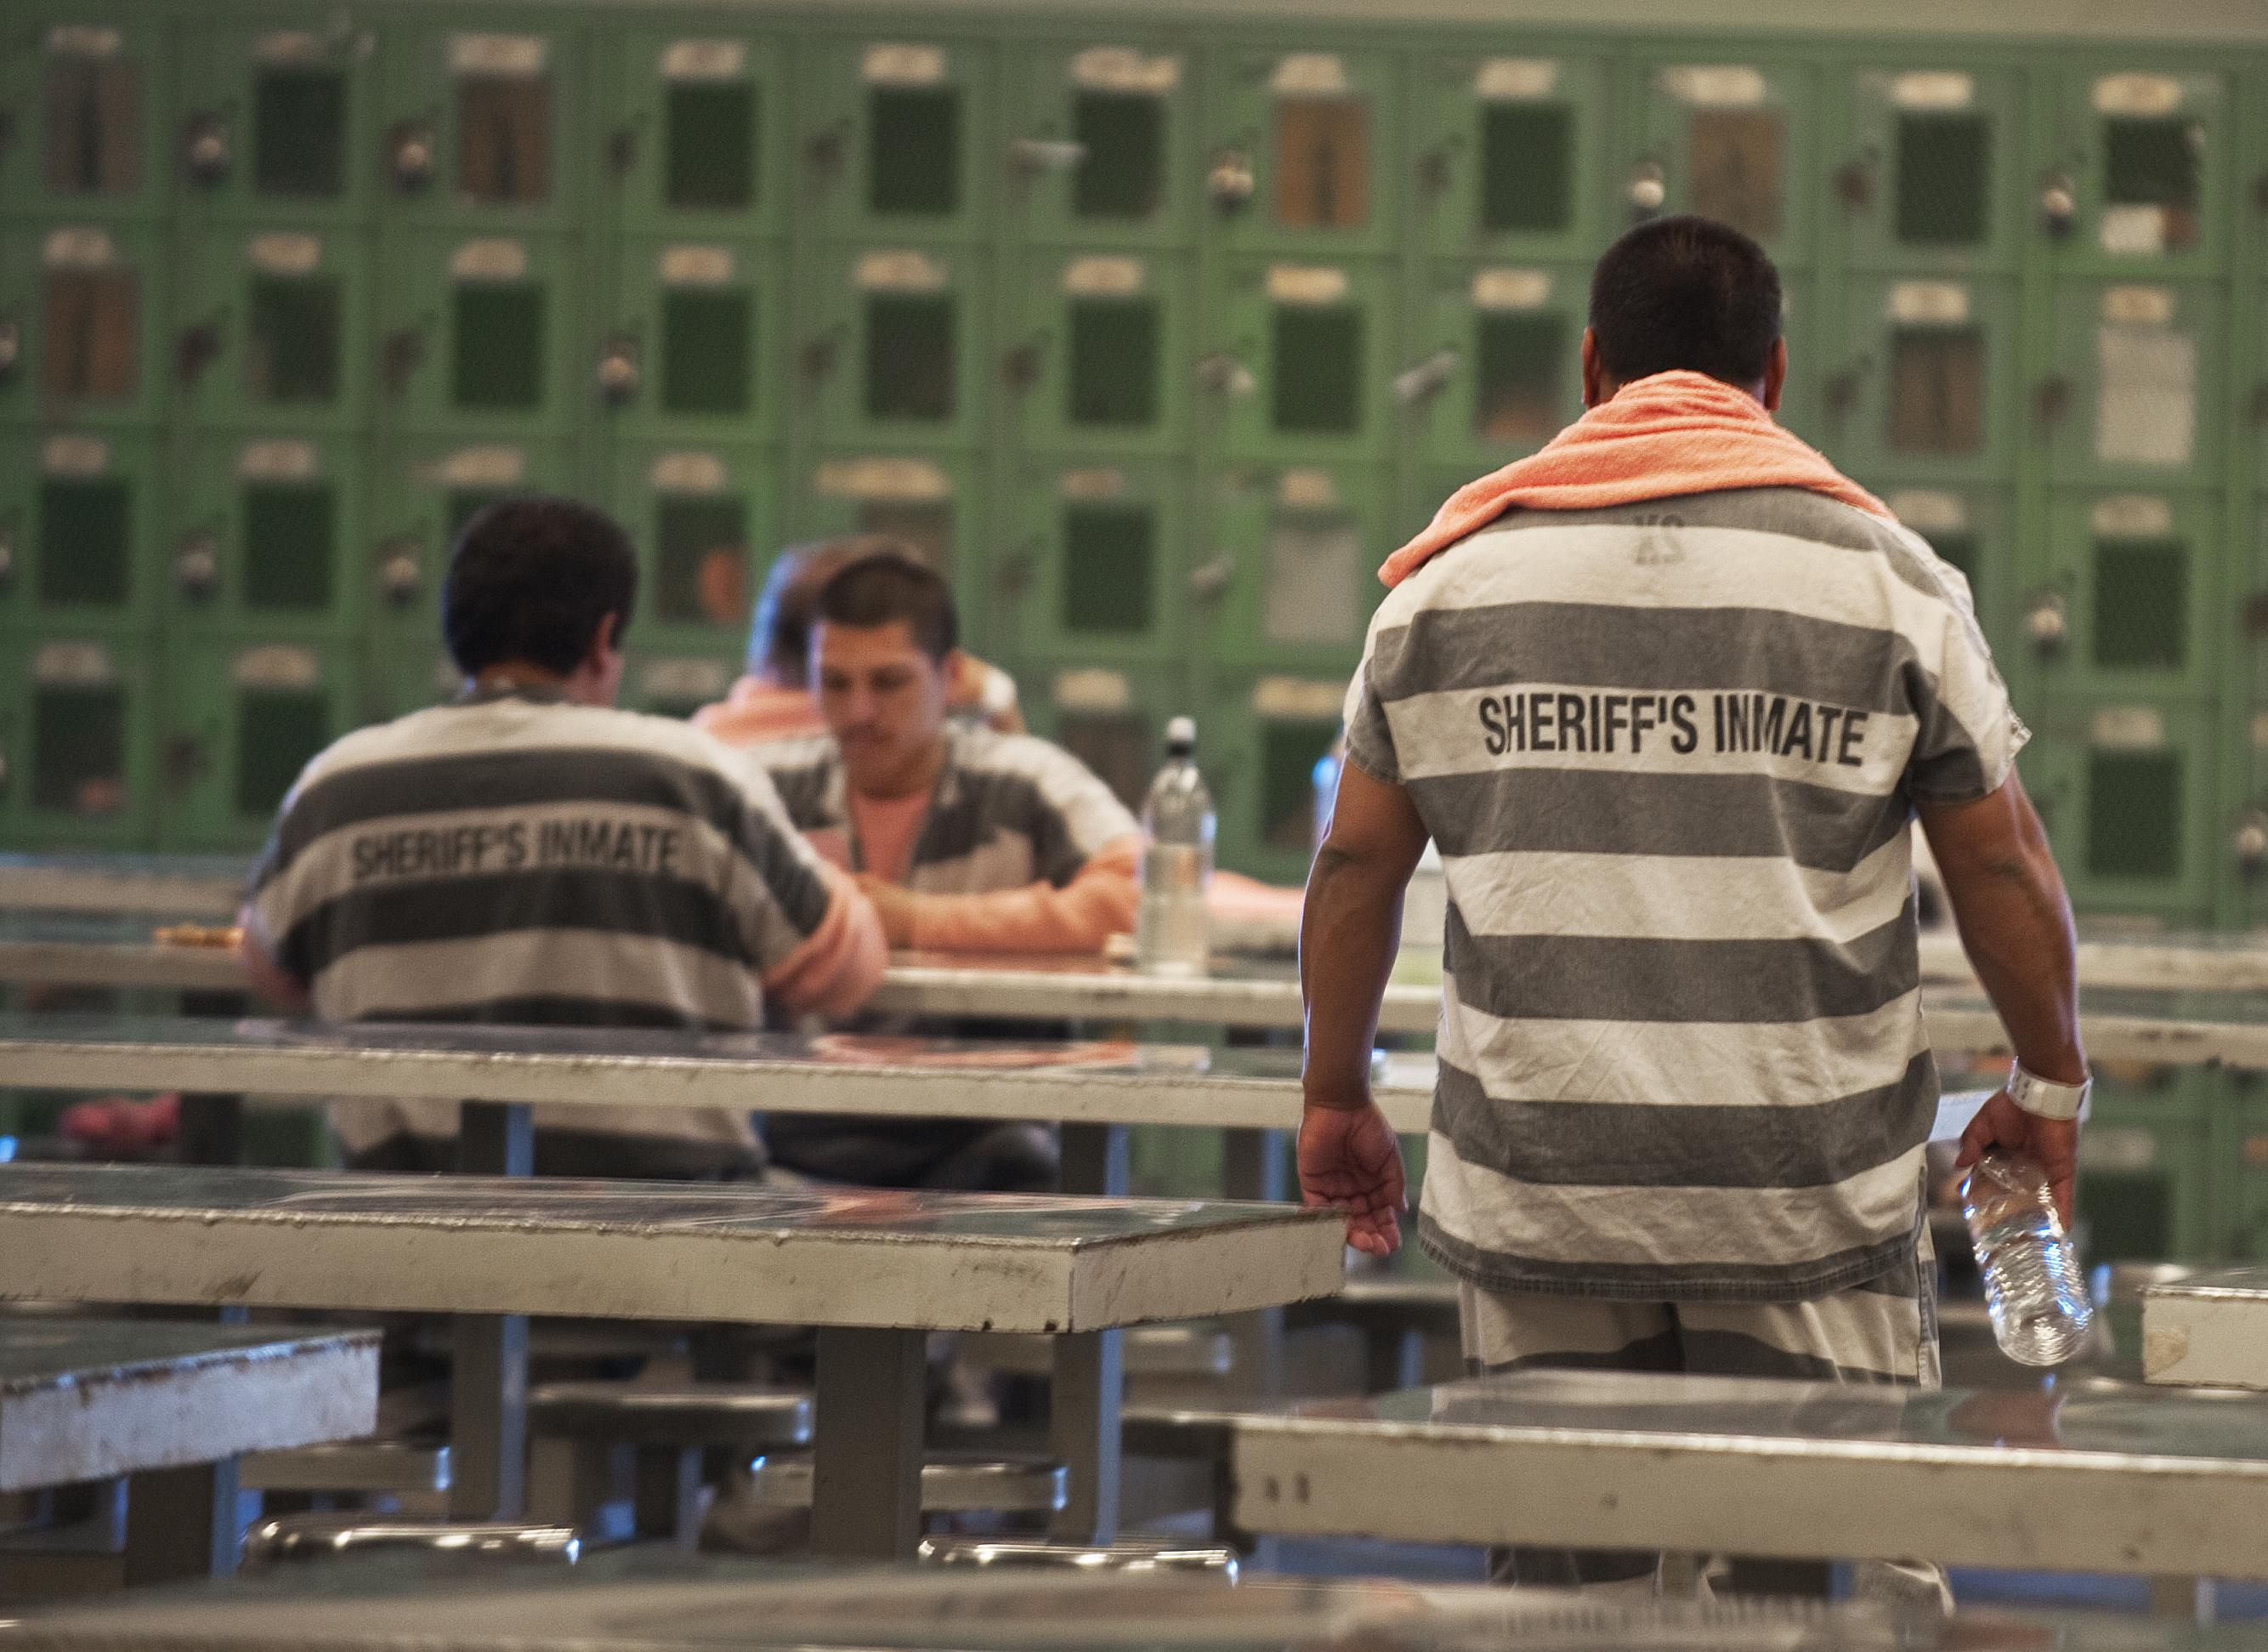 Arizona jail inmates